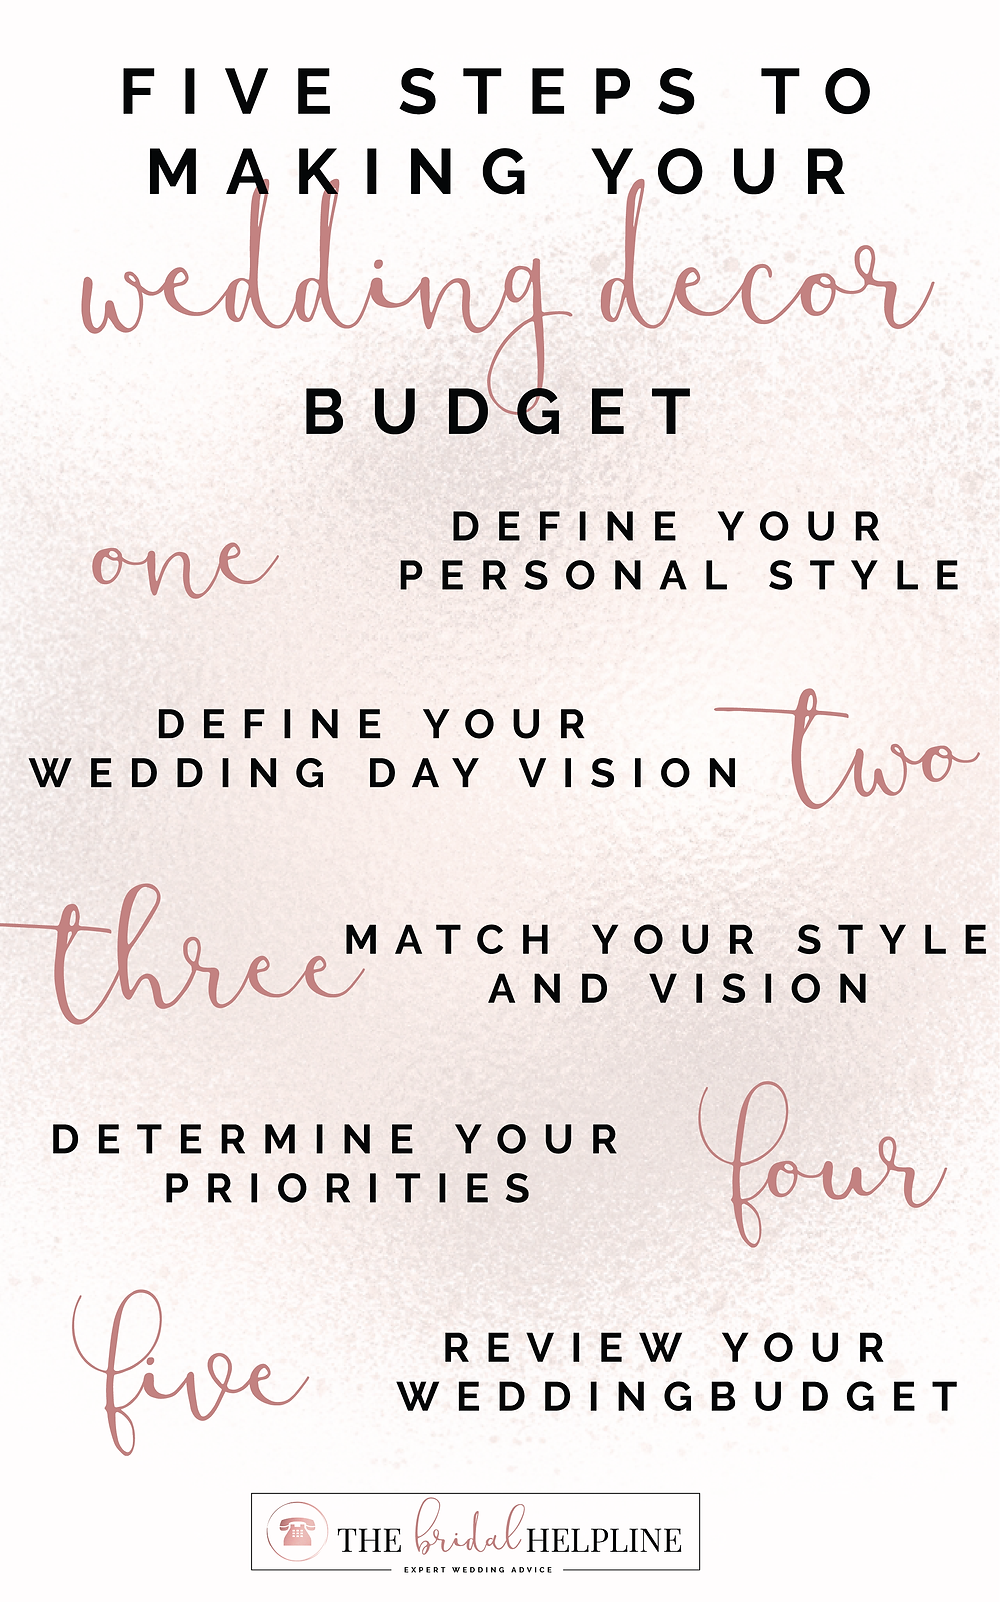 Wedding Decor Budget Tips